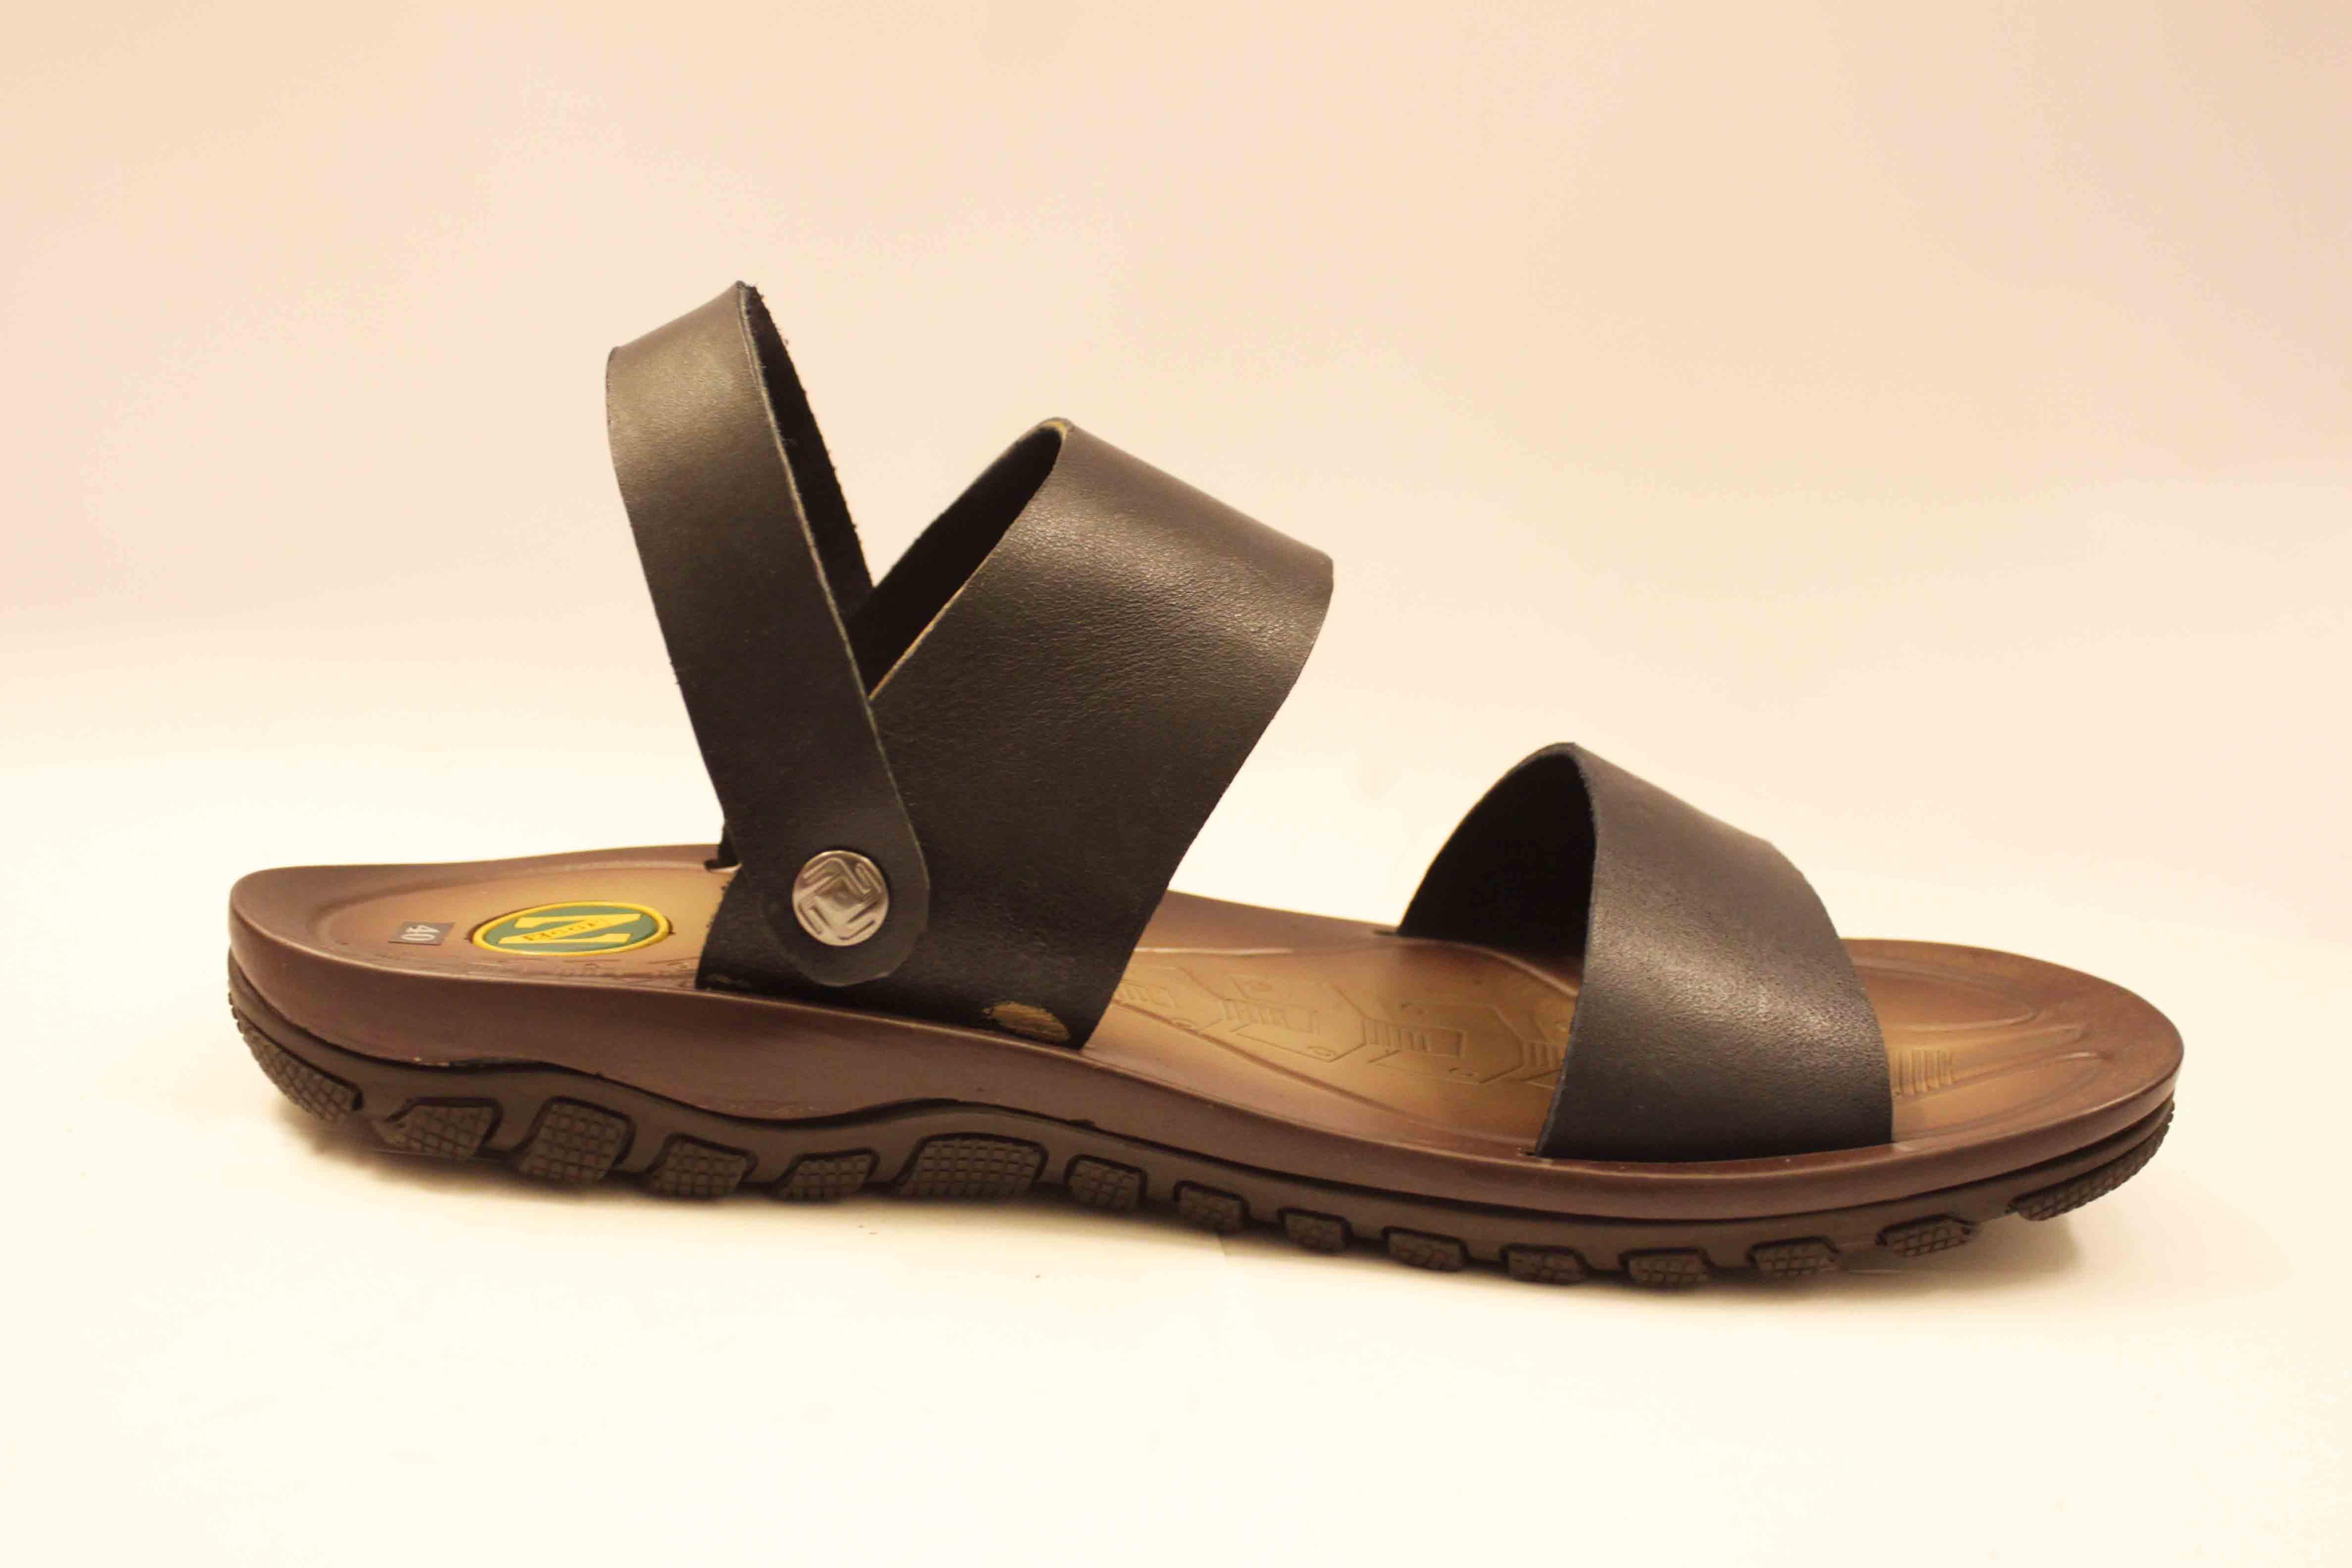 sandal nam quai ngang